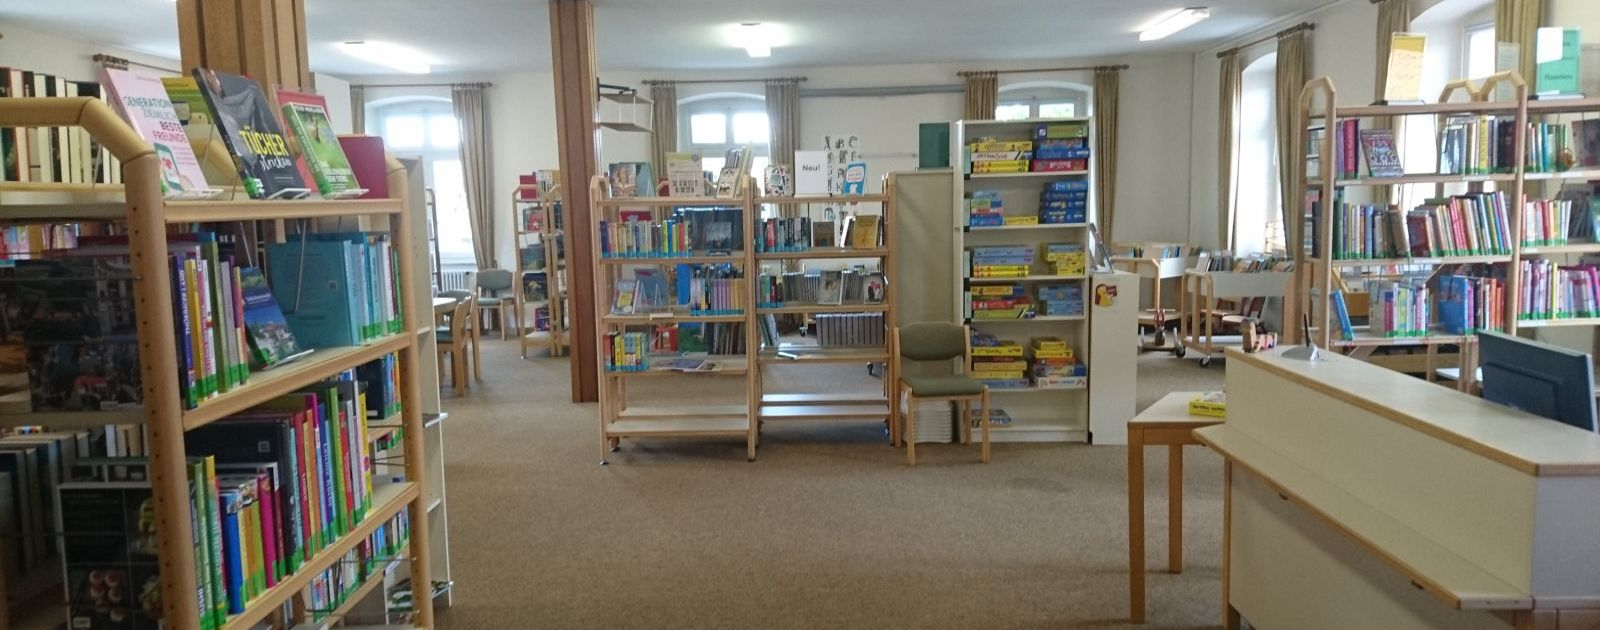 Bücherregale in der Mediathek in Legelshurst